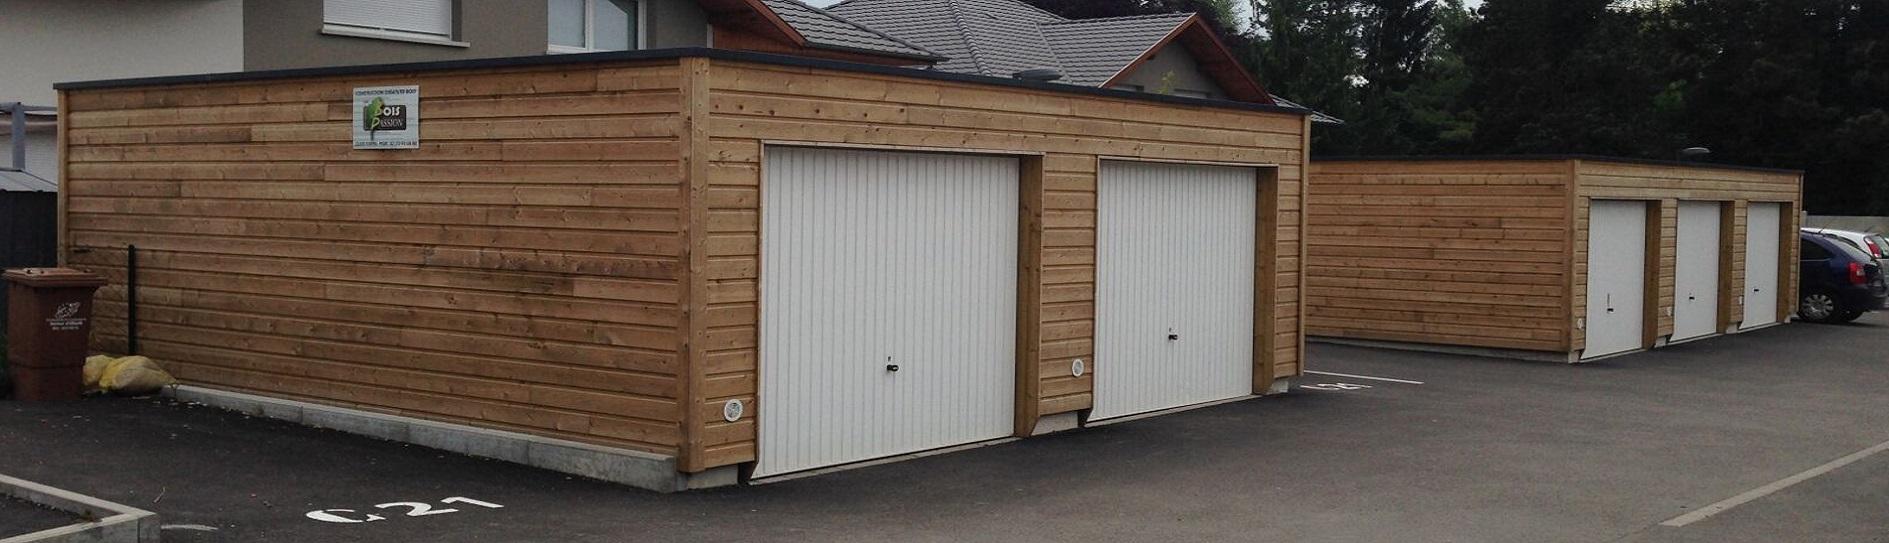 Bardage bois naturel m l ze votre garage bois for Votre garage bois